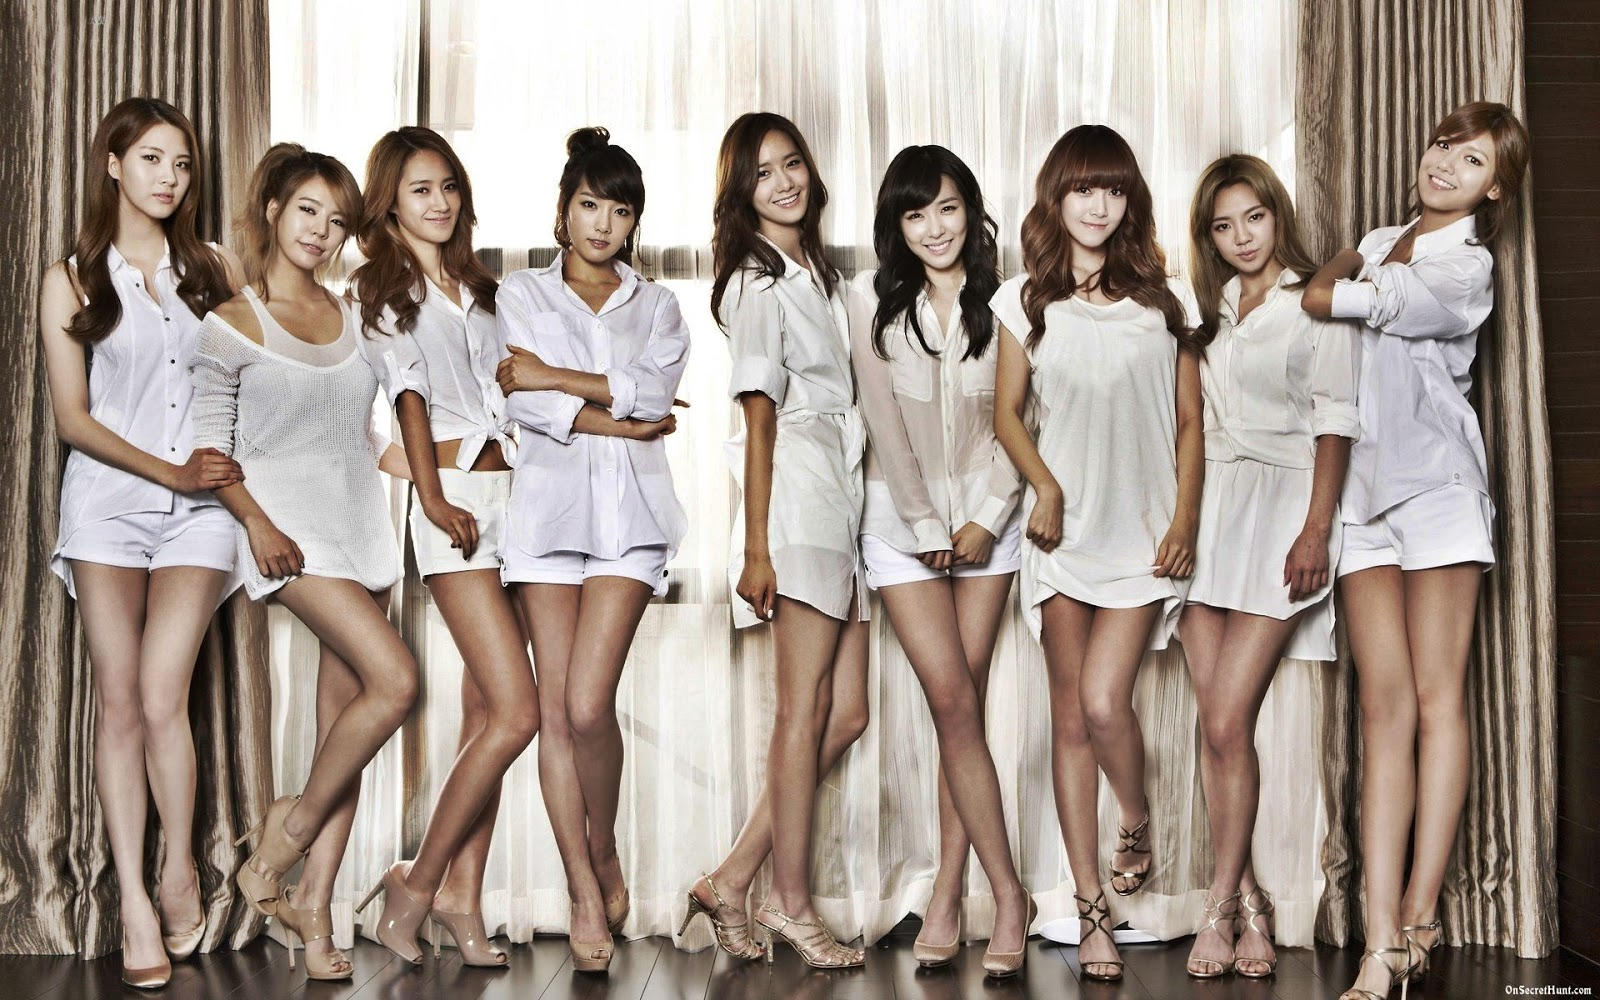 ... search terms 2011 girls generation tour 2011 girls generation tour dvd Girls